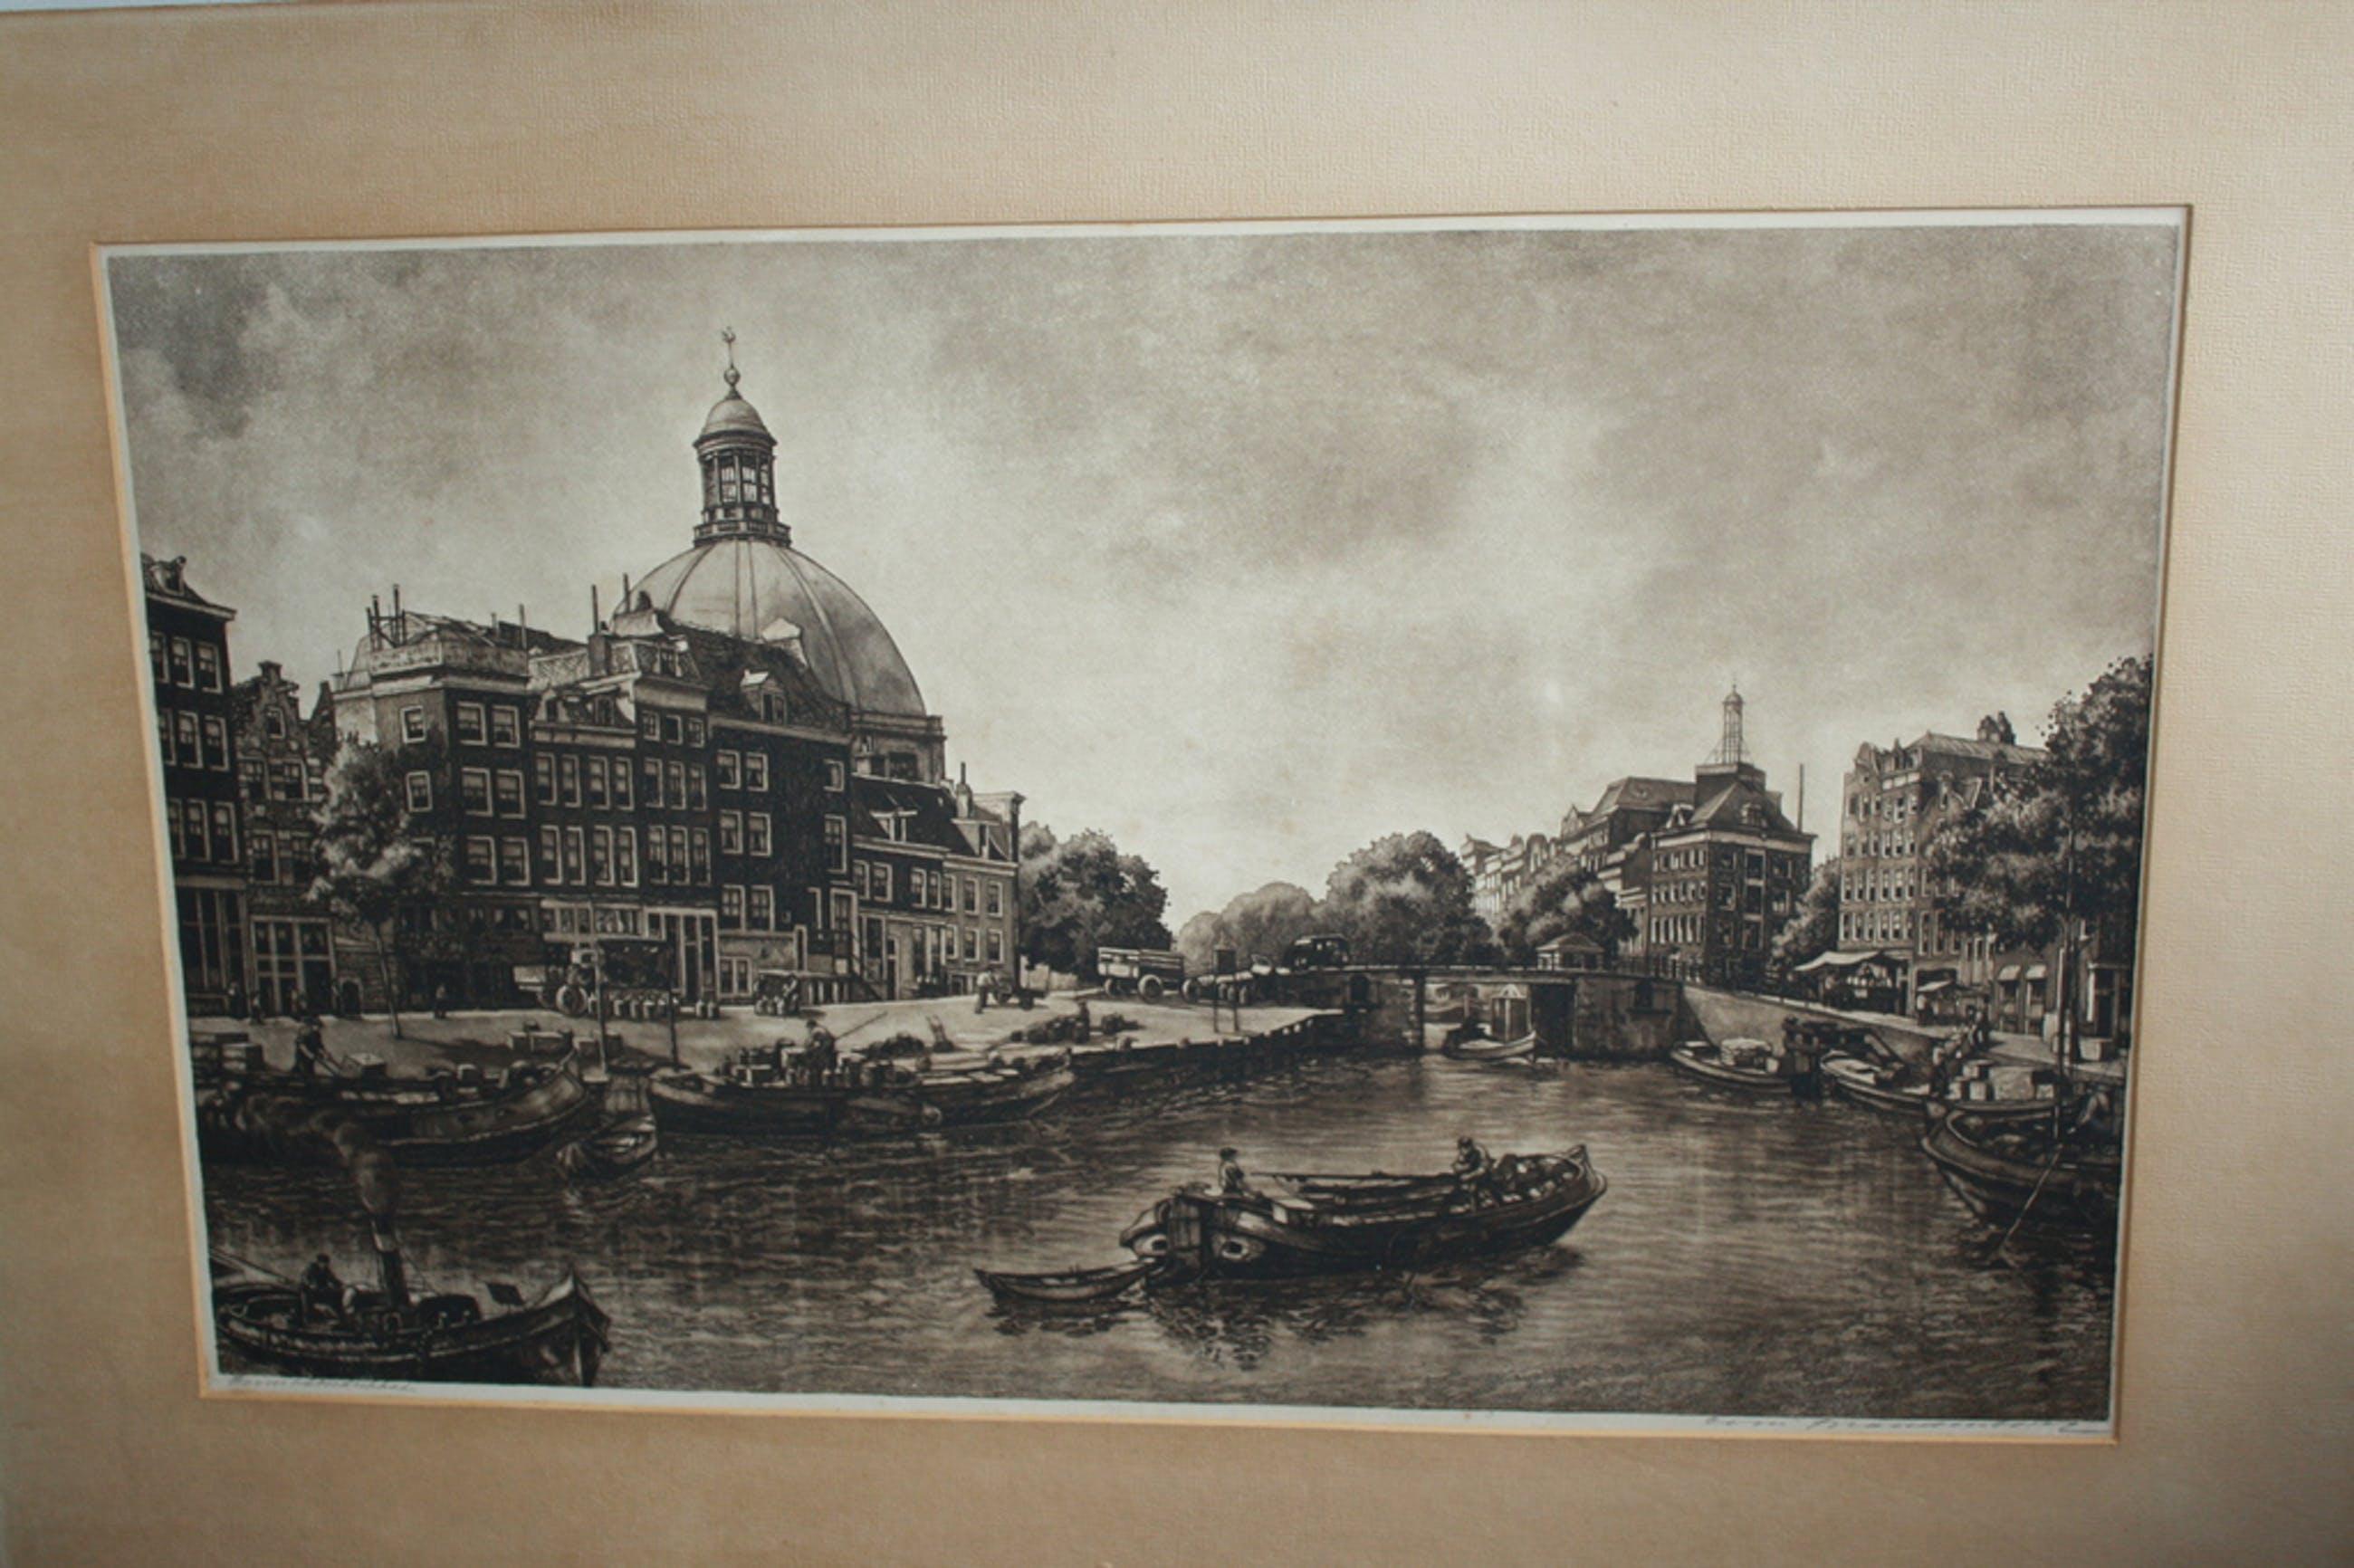 CORNELIS BRANDENBURG  - GROTE ETS PRINSHENDRIKKADE kopen? Bied vanaf 90!